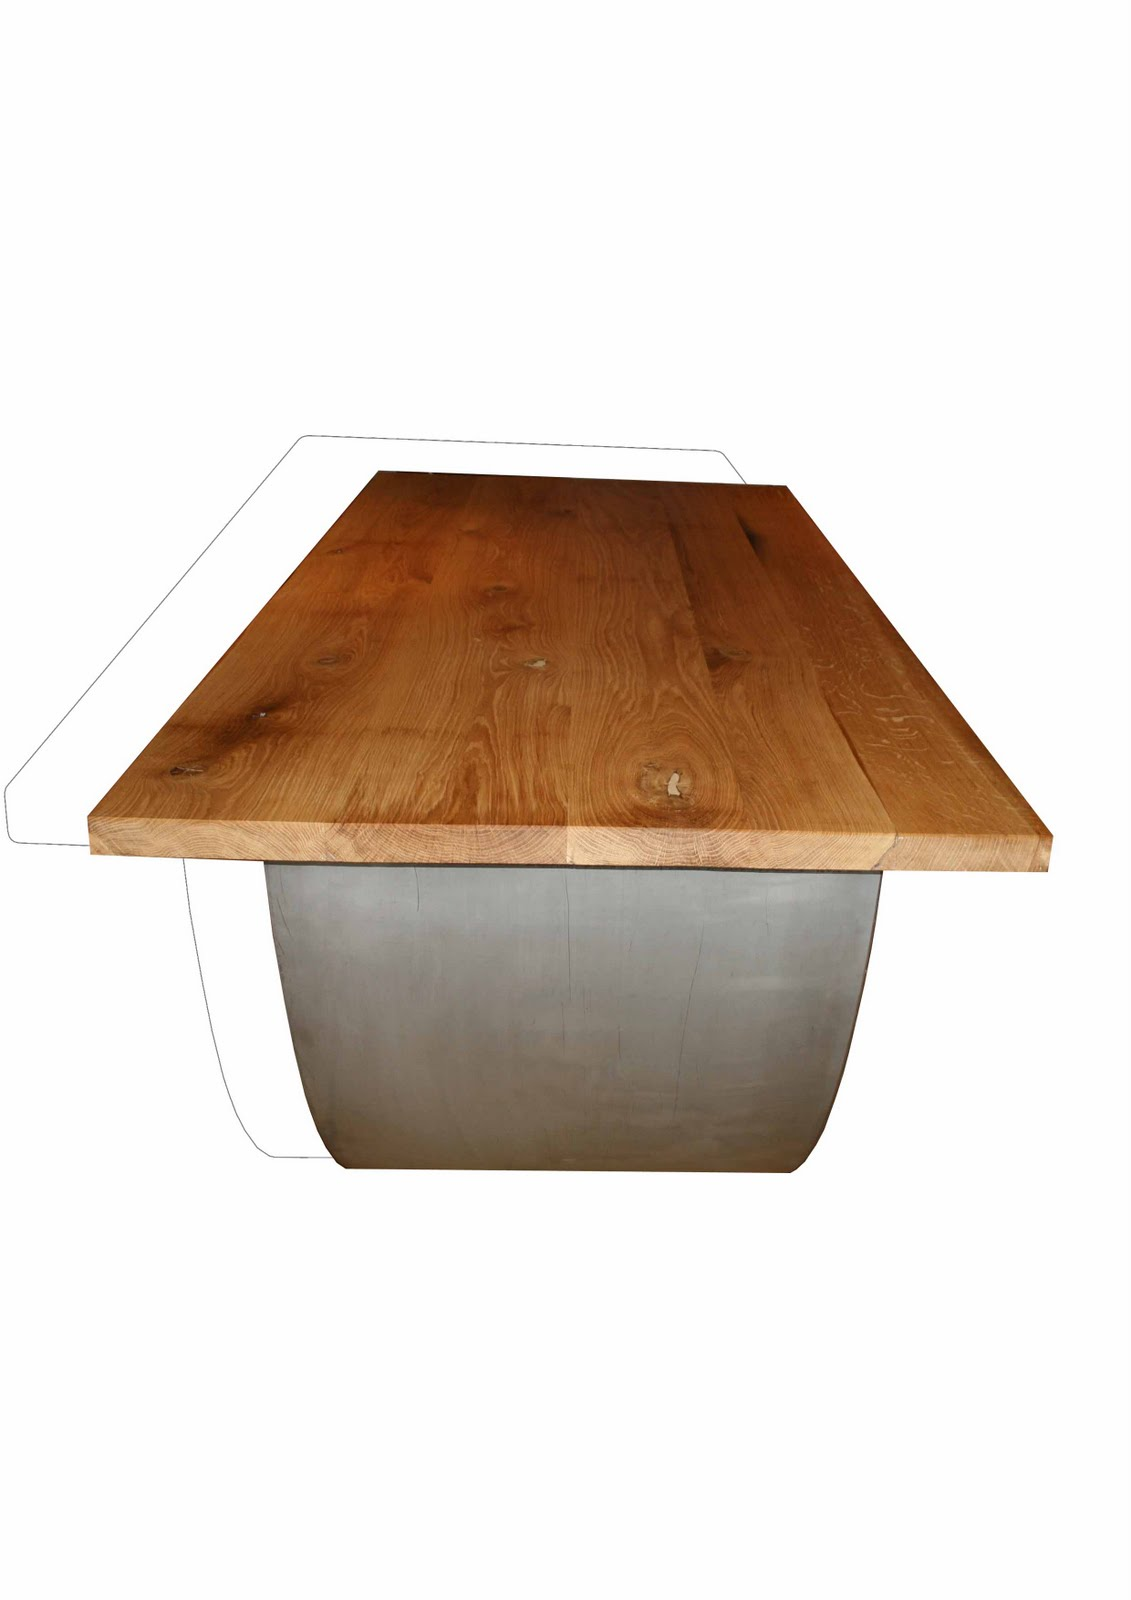 la petite fabrik table inox. Black Bedroom Furniture Sets. Home Design Ideas